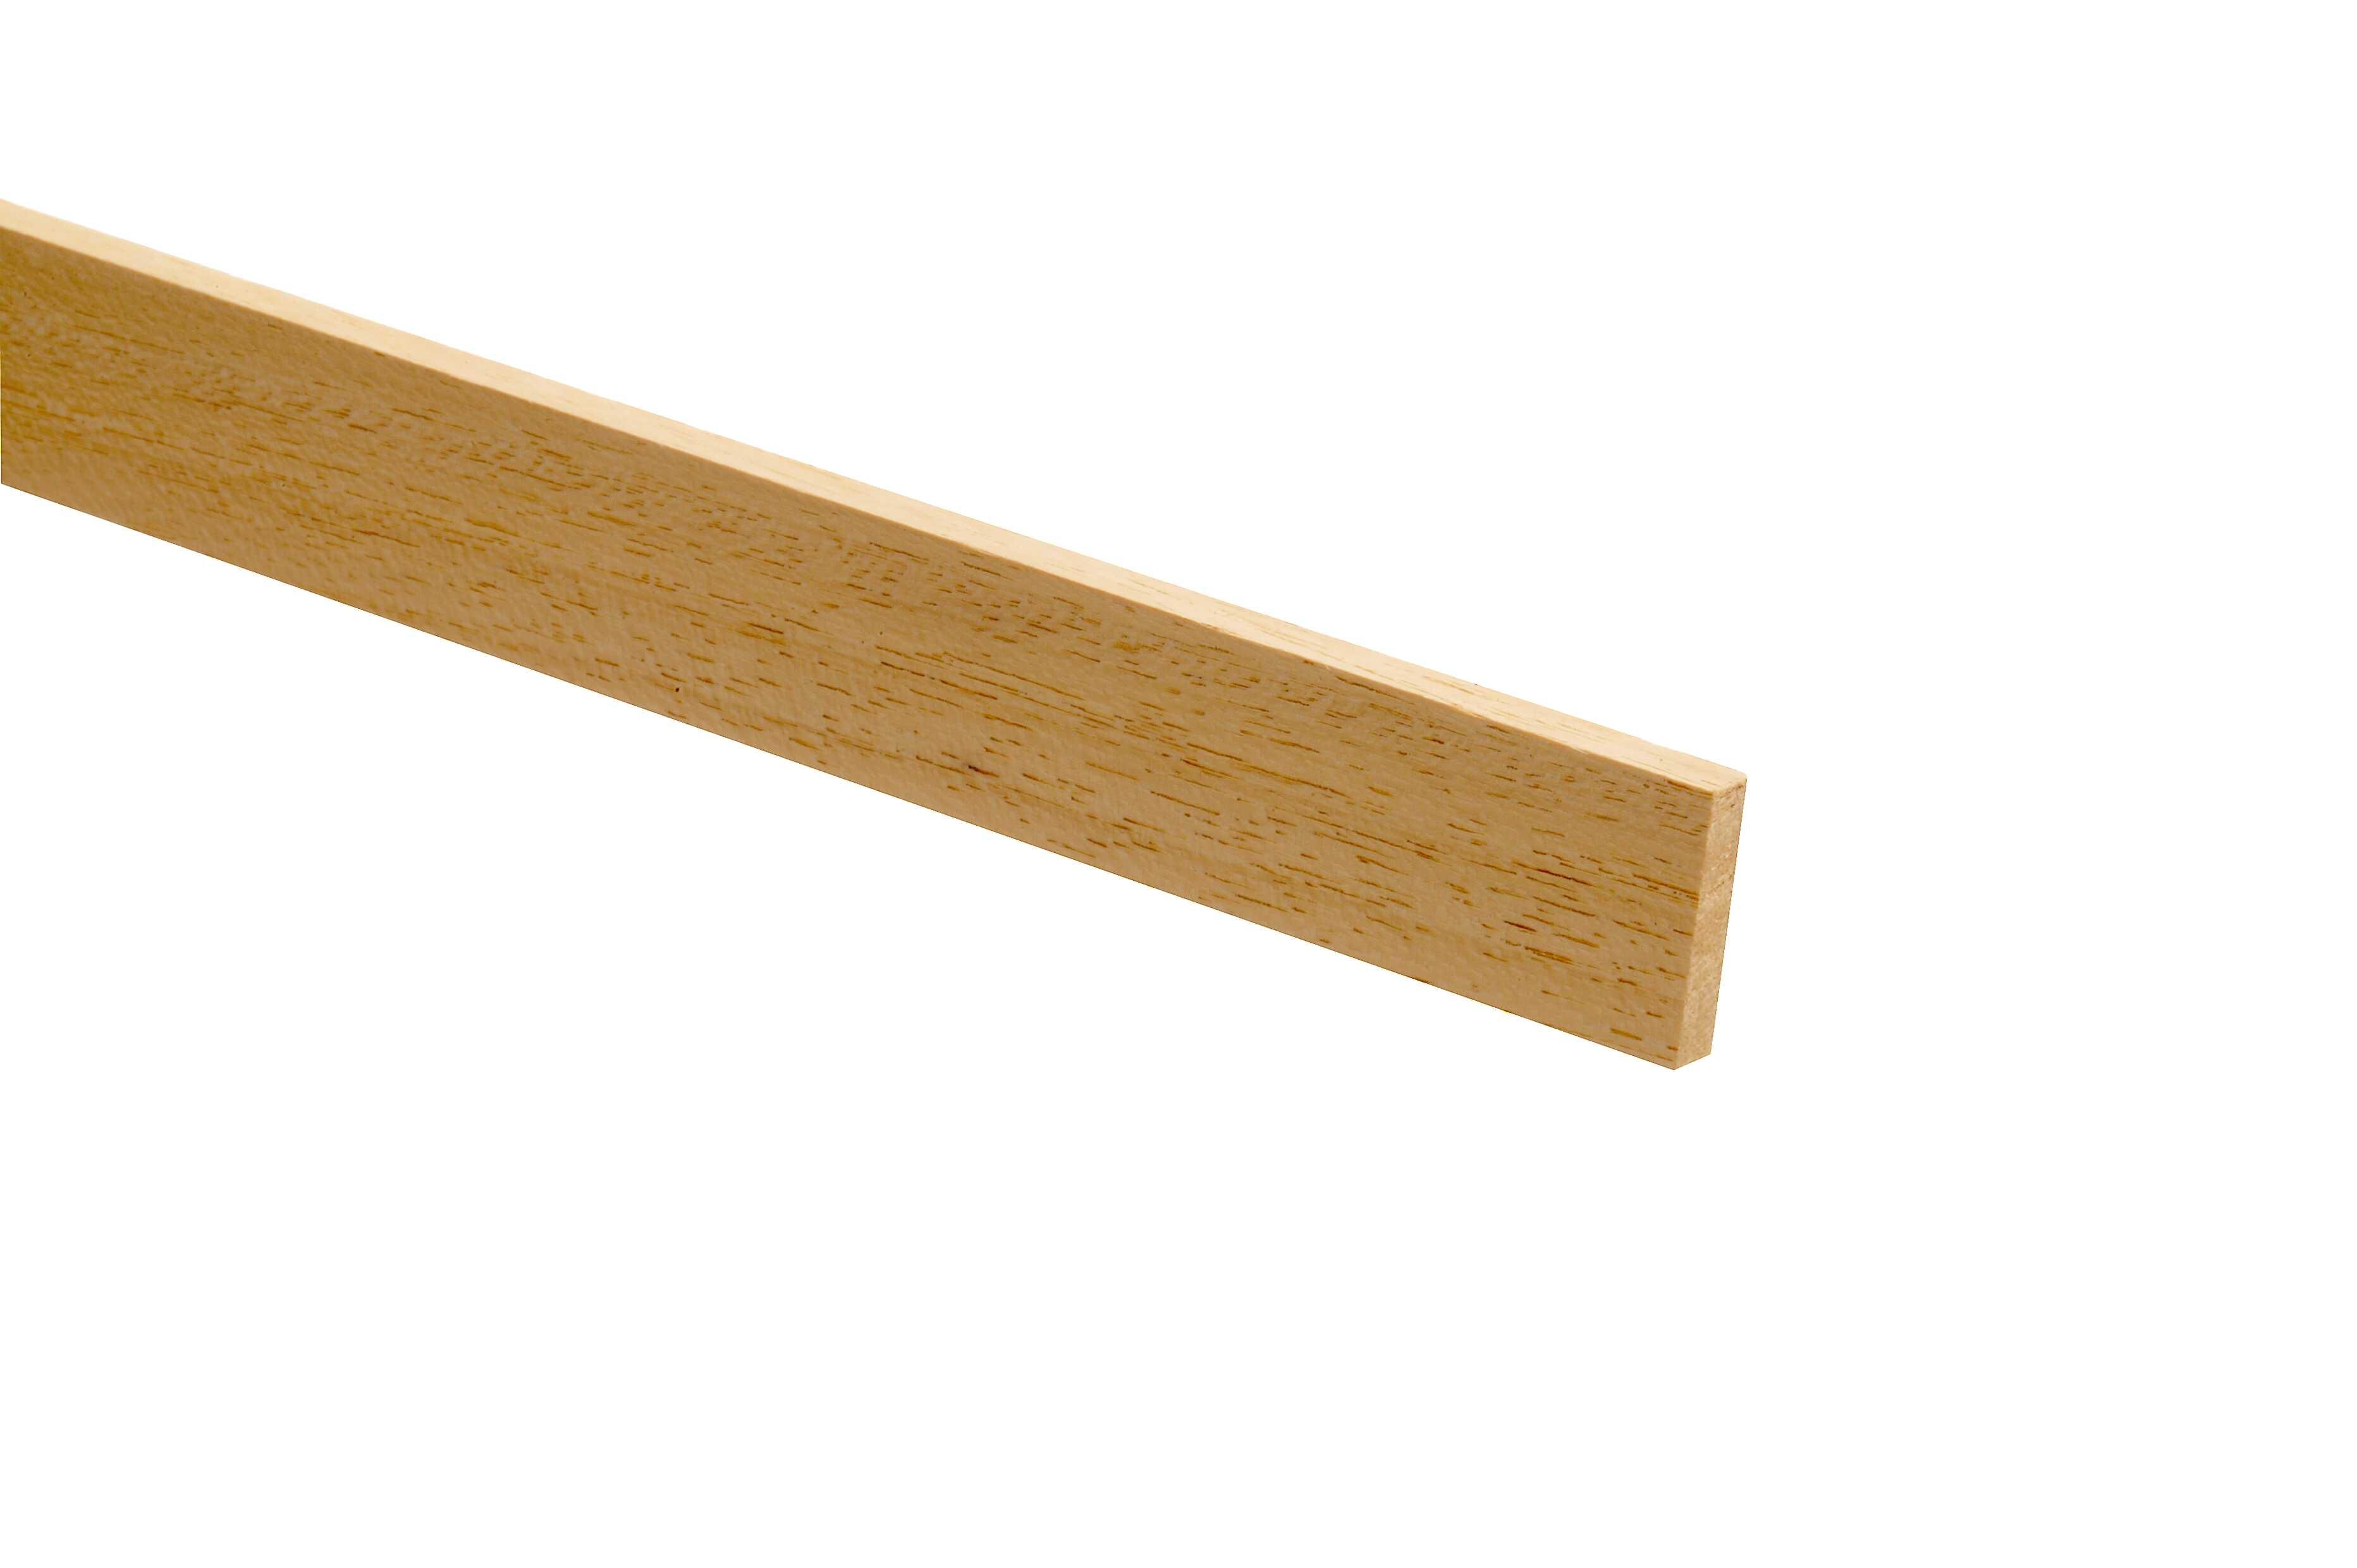 35 Light Hardwood PSE Stripwood 3 x 21 x 2400mm